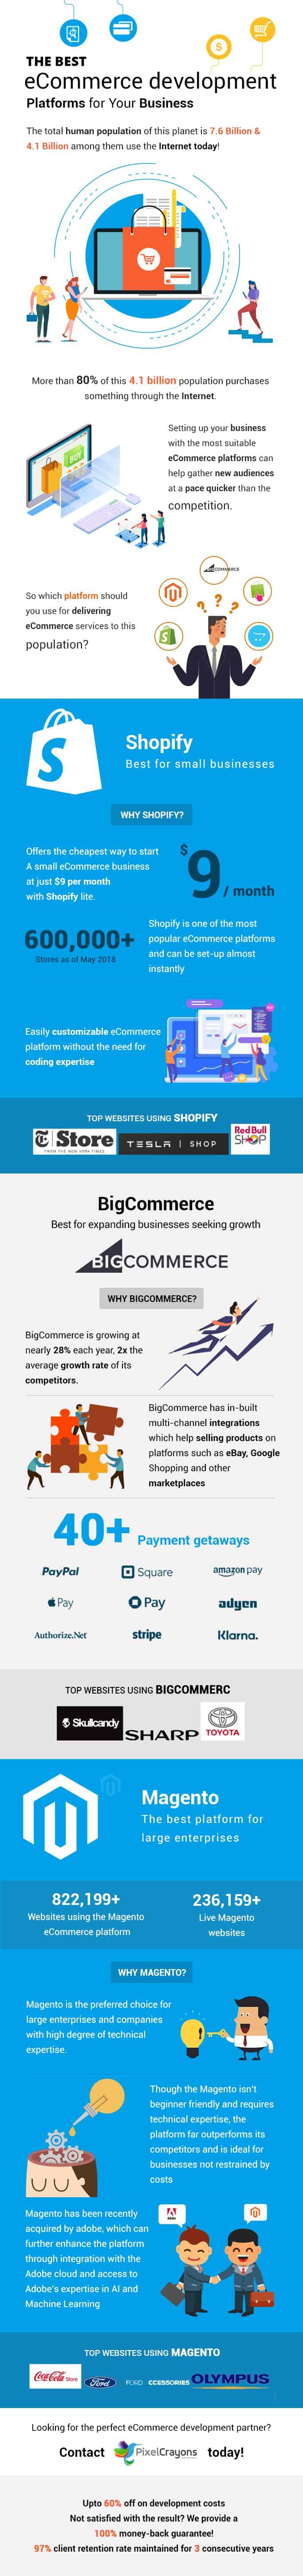 best ecommerce platforms, top ecommerce platforms